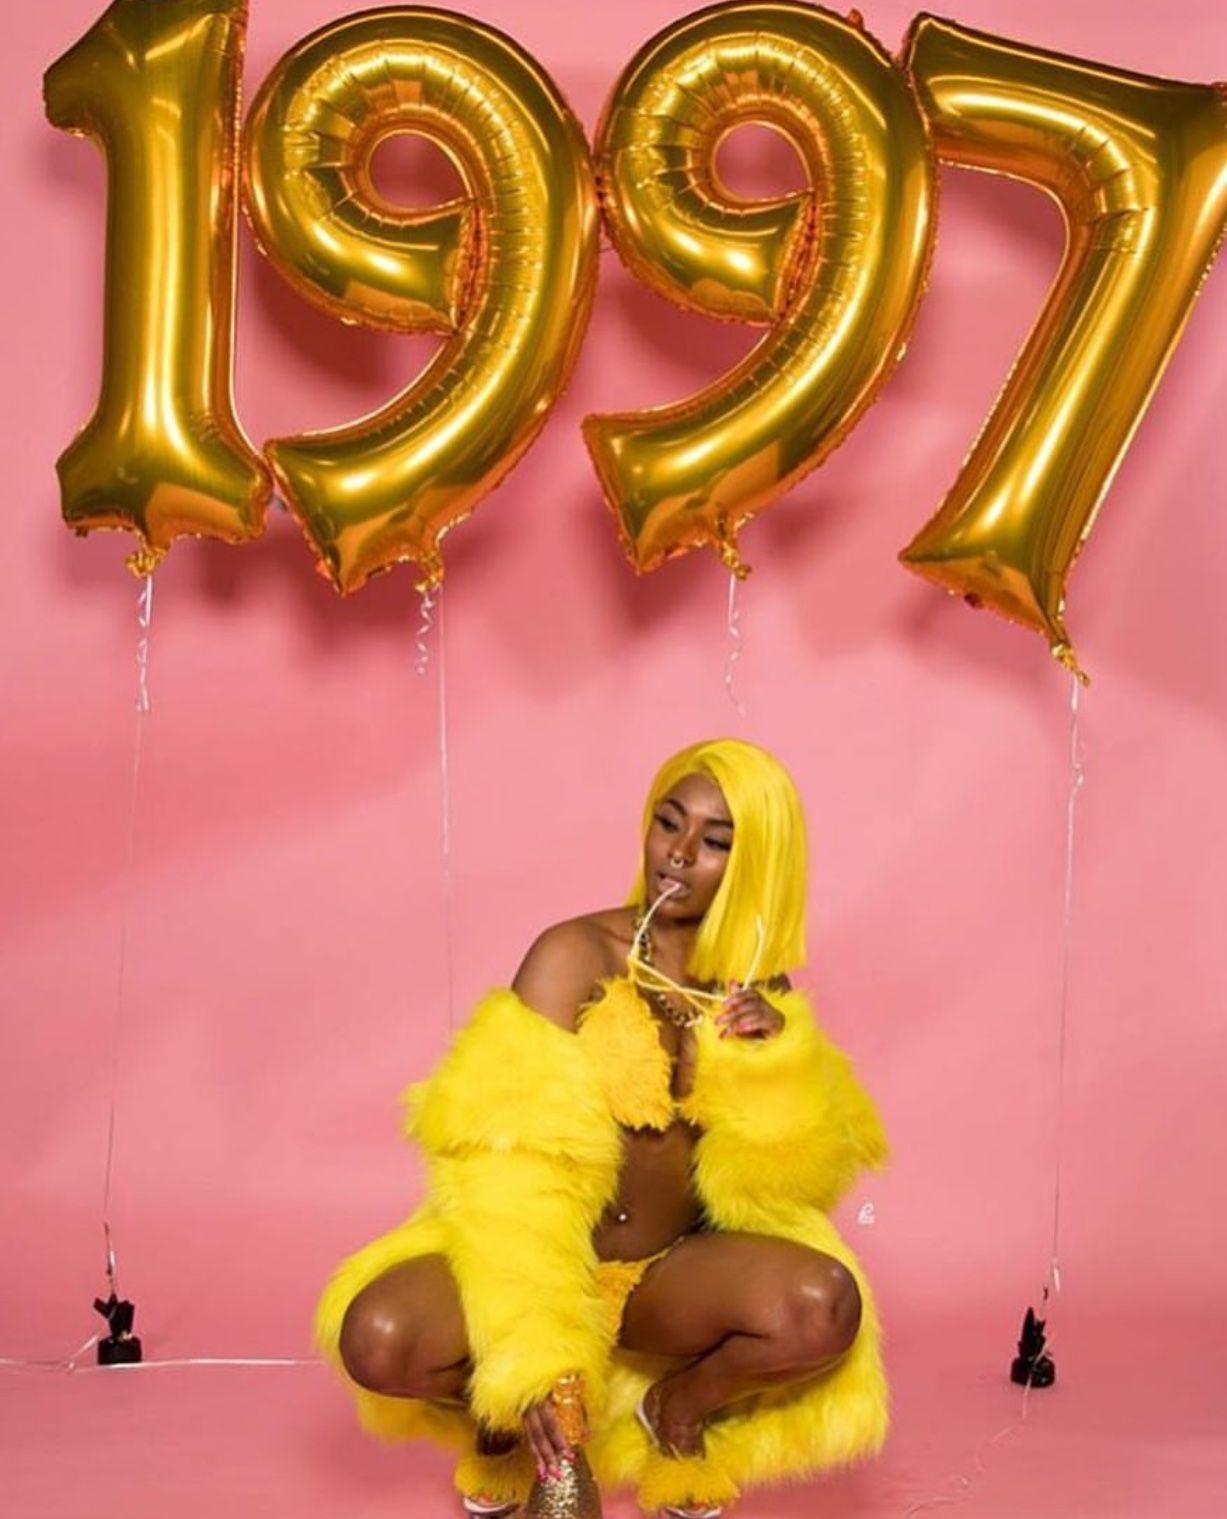 100 Birthday Ideas In 2021 21st Birthday Photoshoot Birthday Photoshoot Birthday Goals